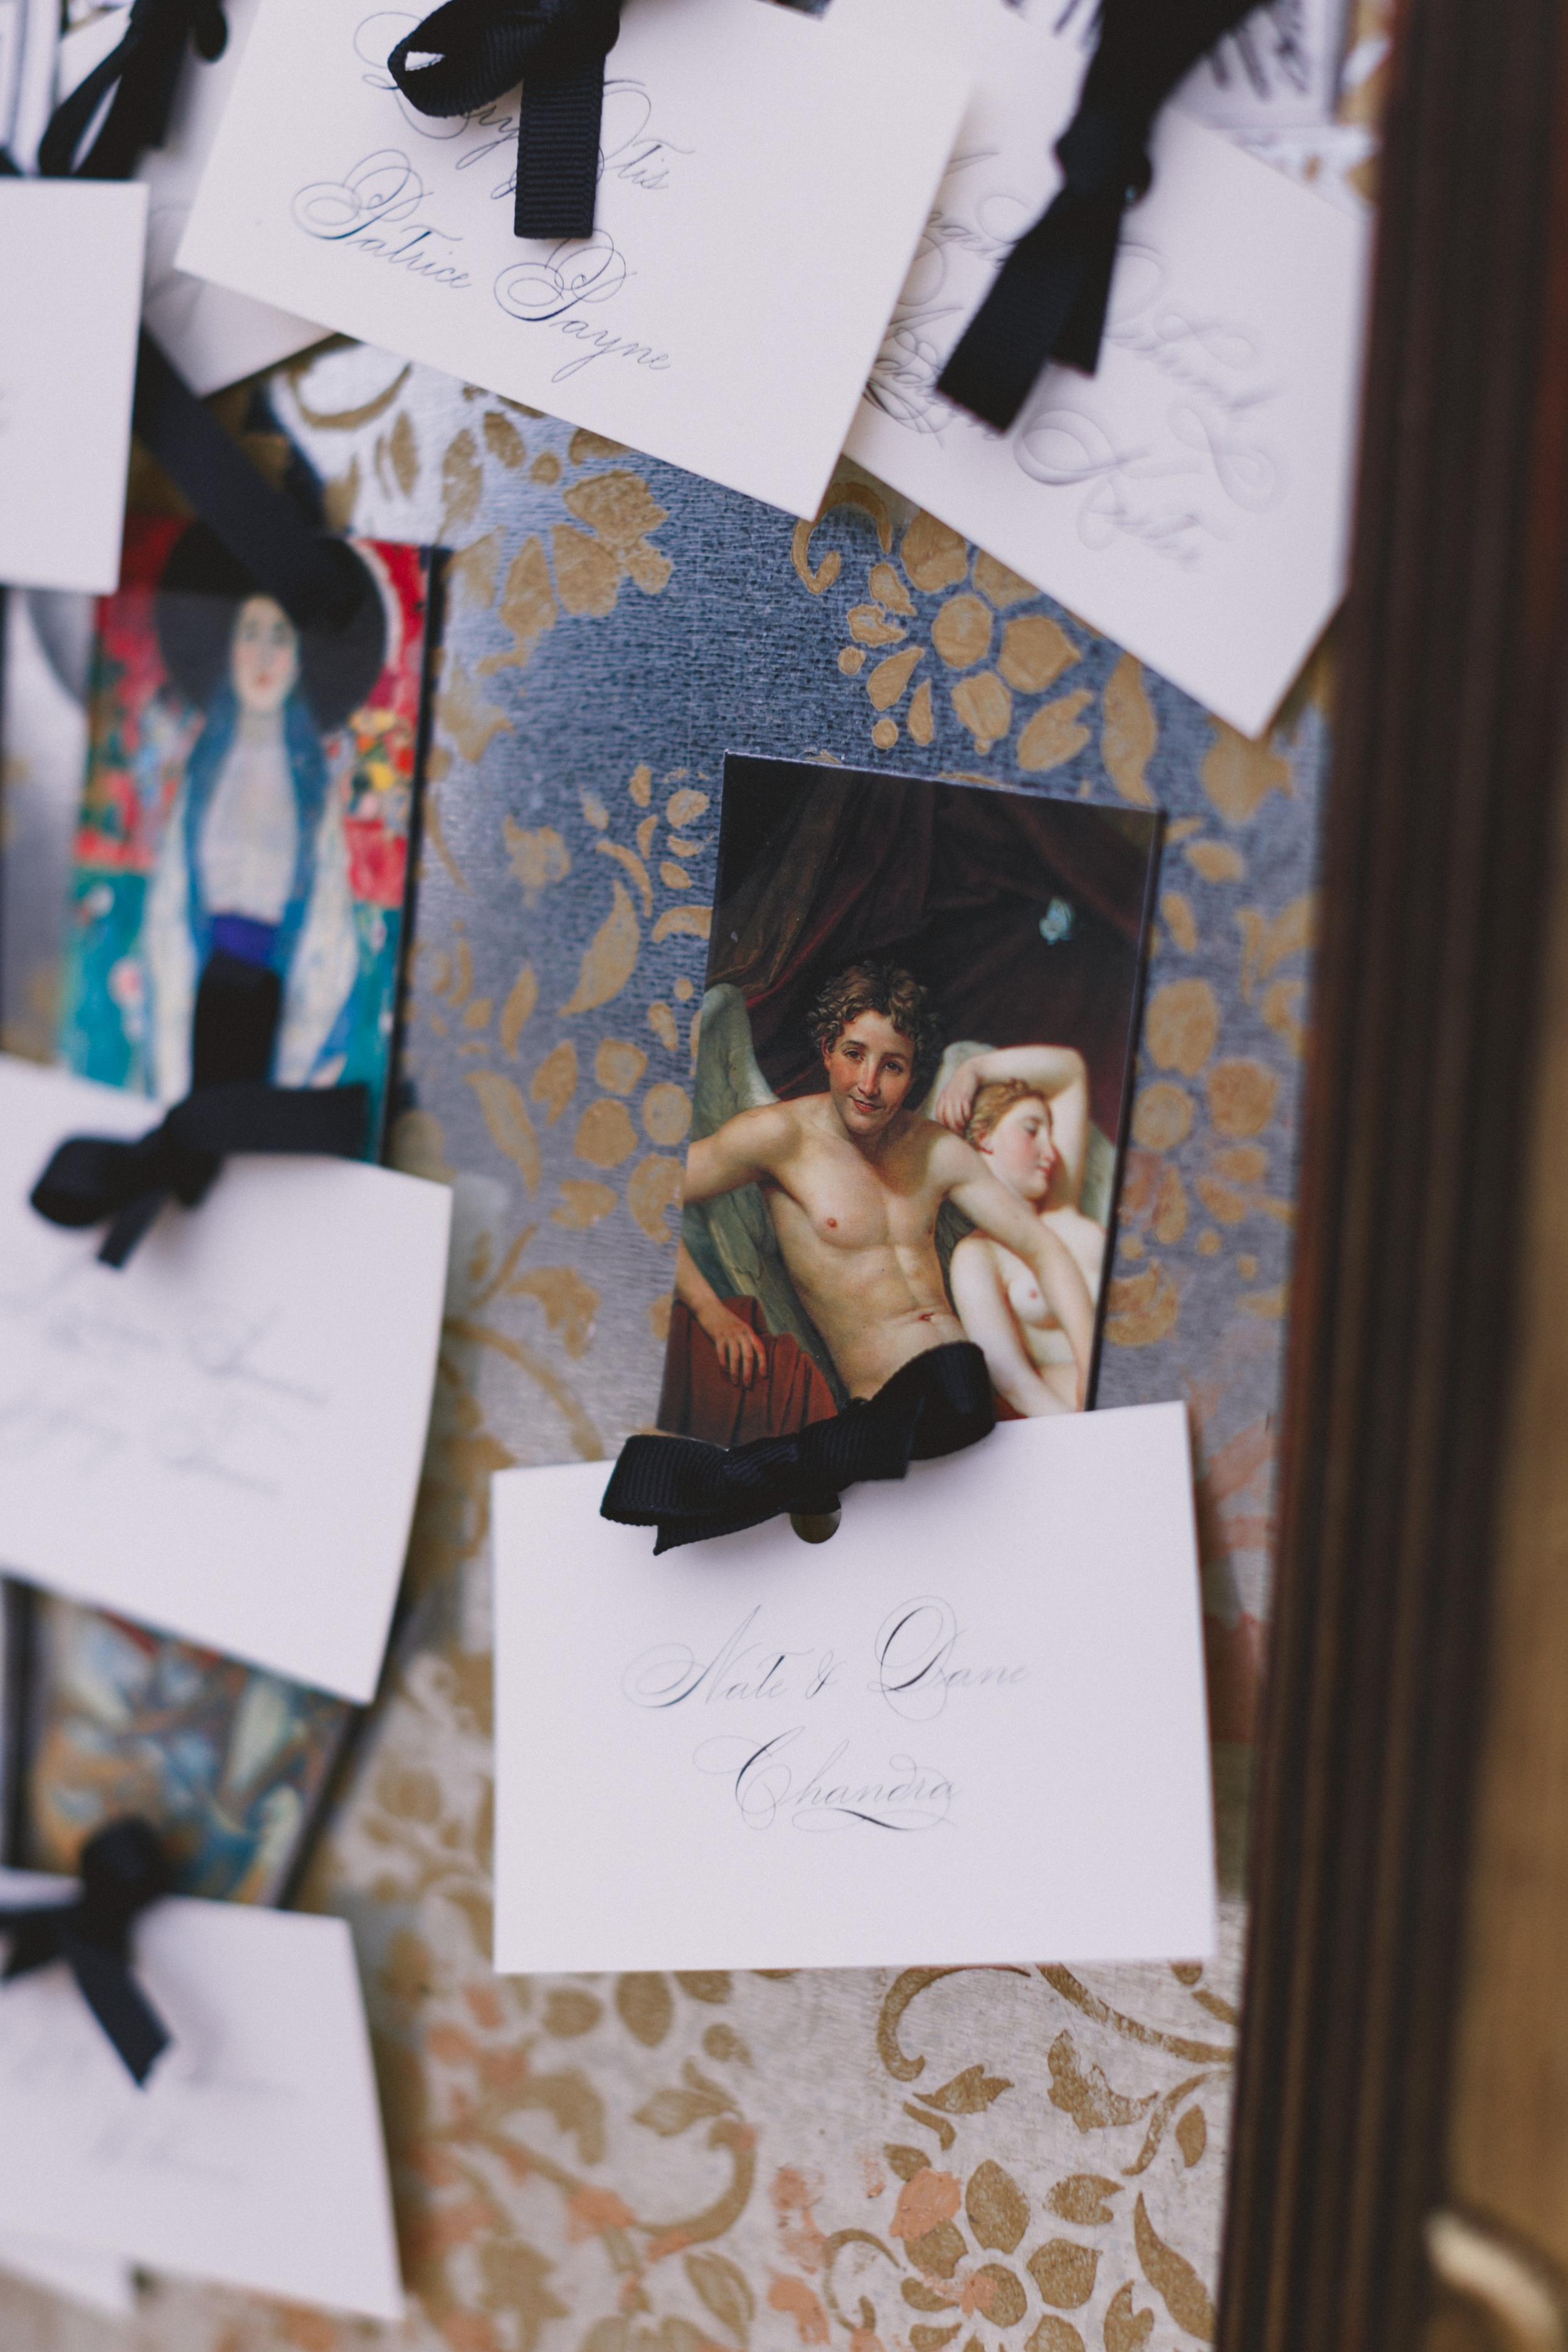 JENNIFER-SKOG-dane-nate-santa-lucia-preserve-wedding-0511.jpg